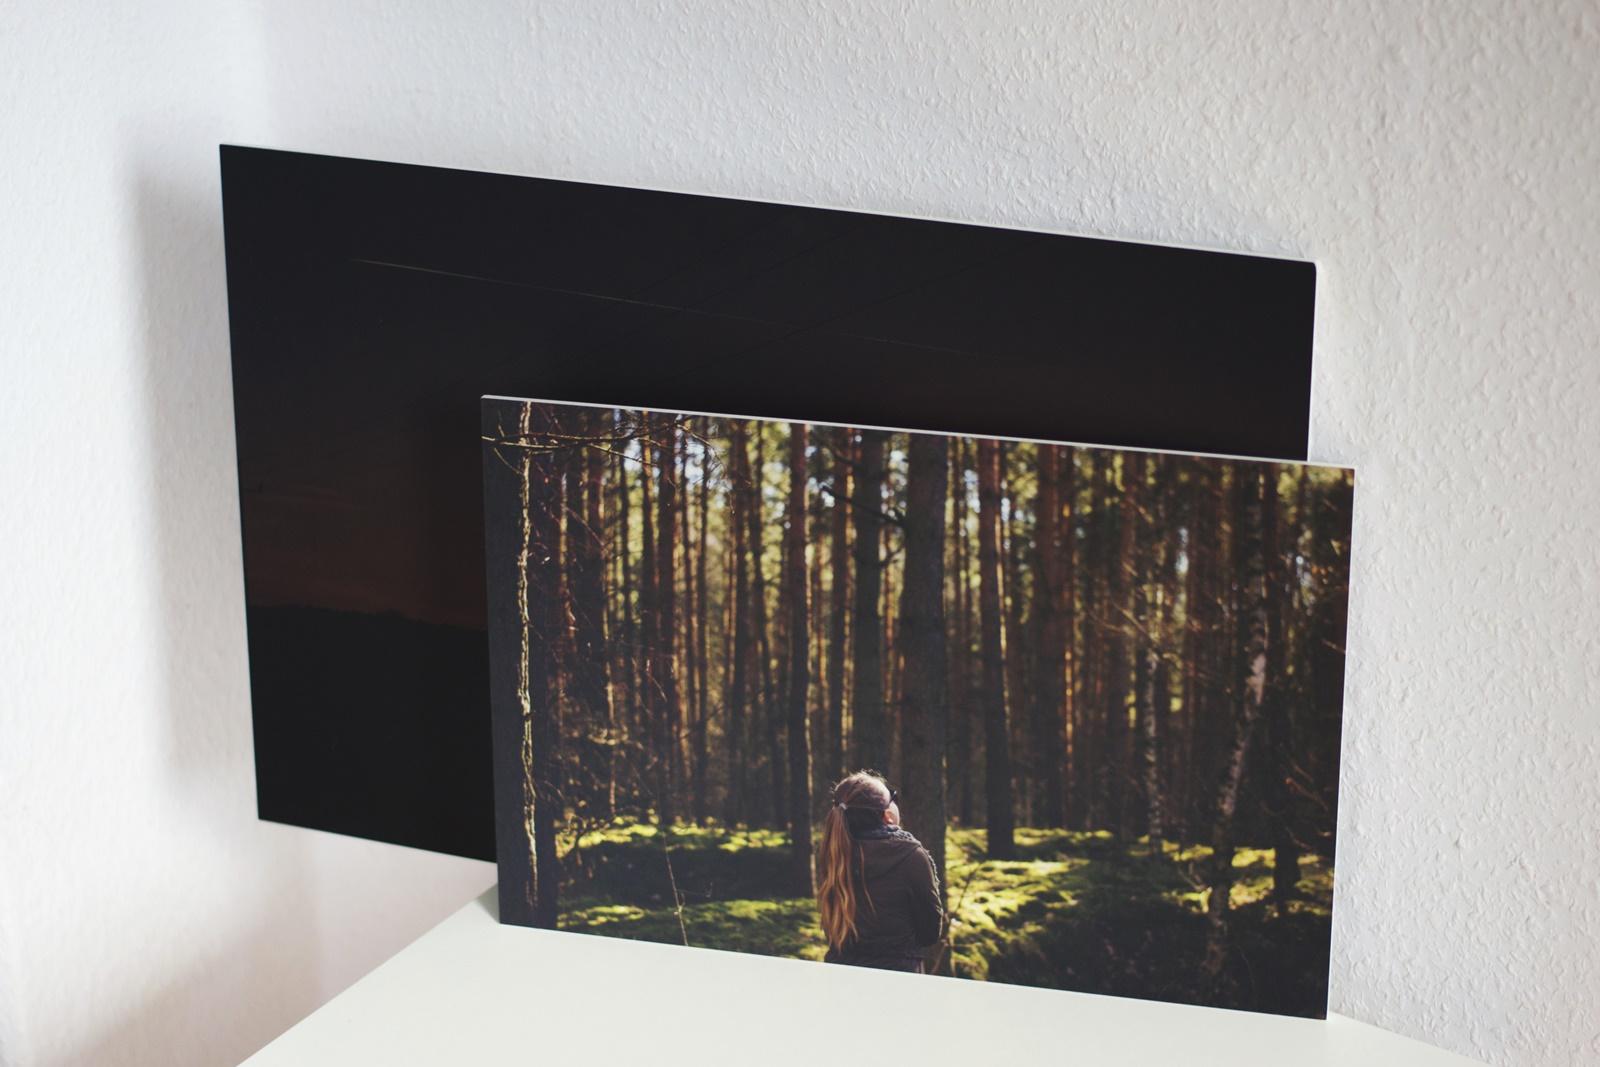 Fotoobrazy od Saal-Digital